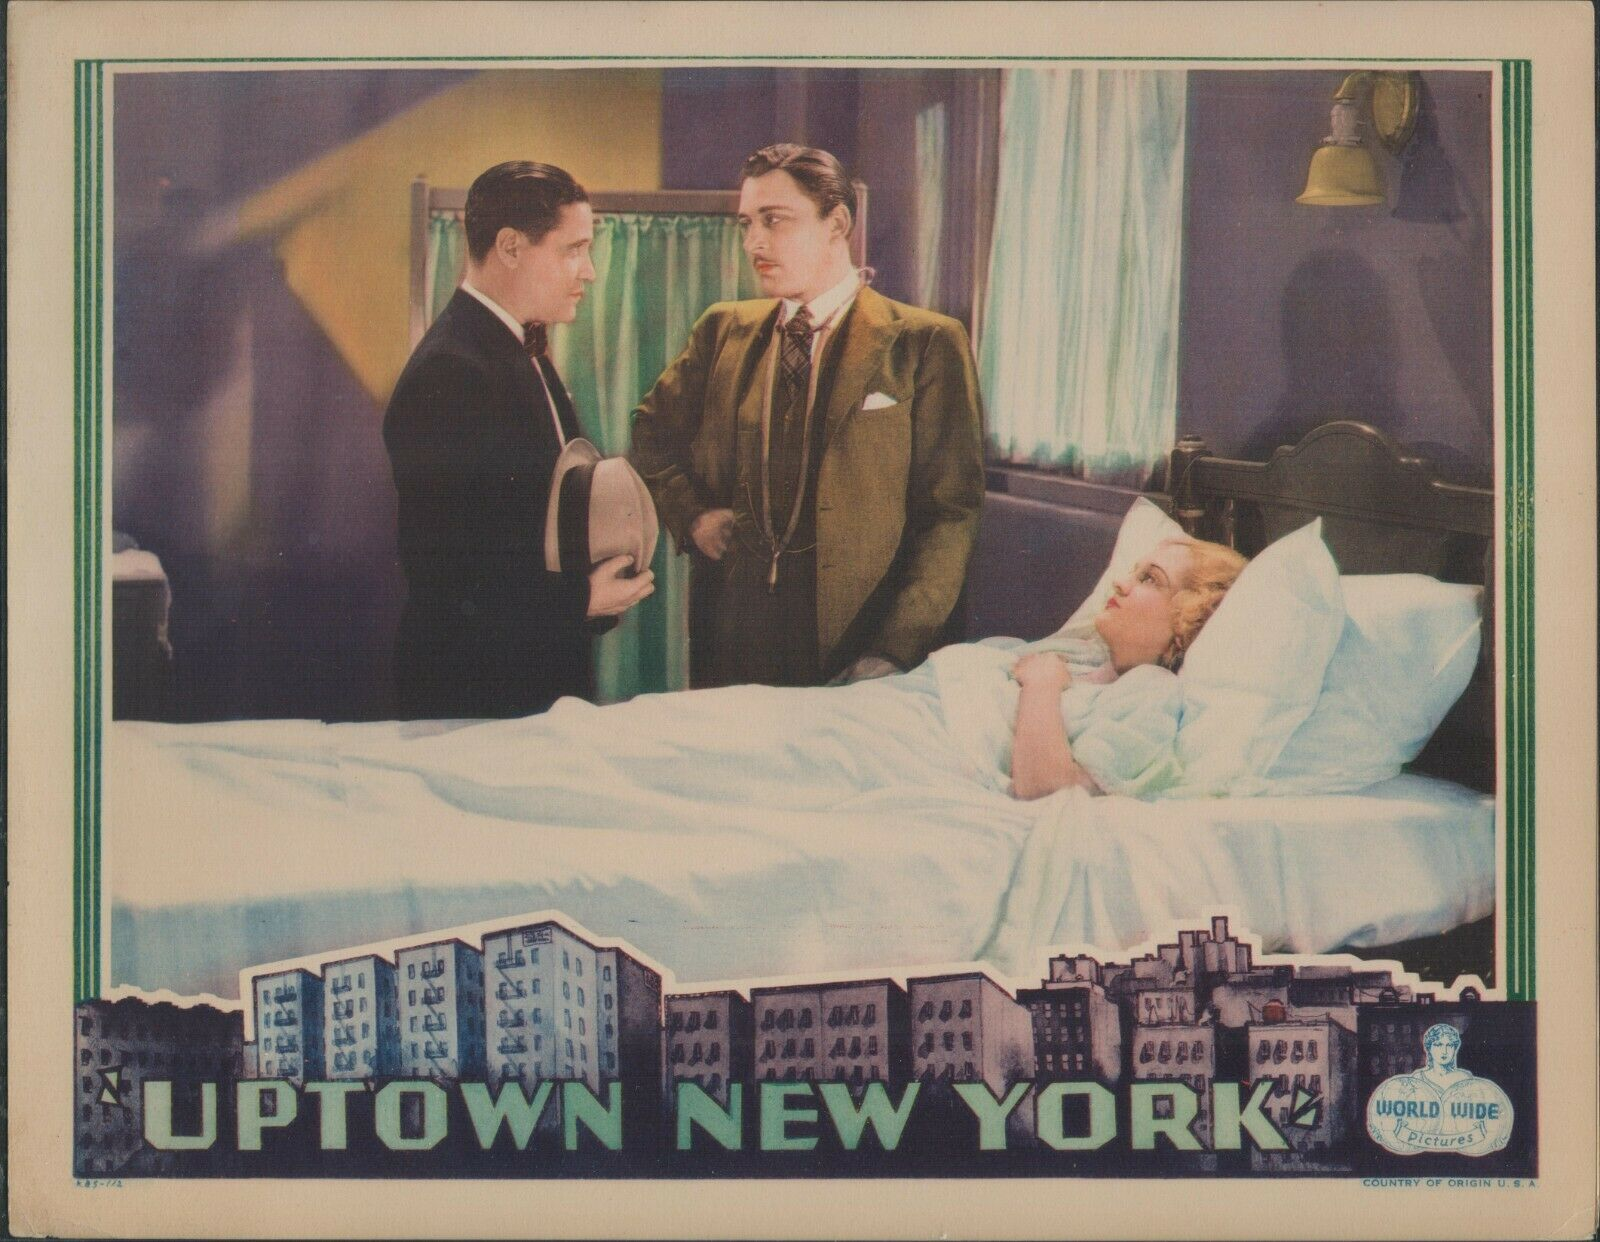 Uptown New York (1932)